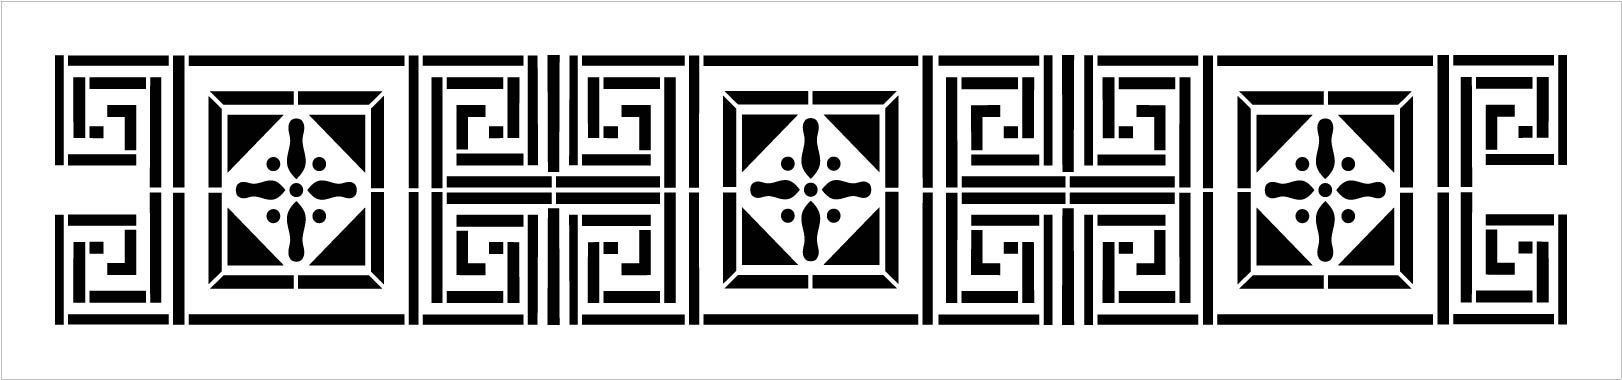 Meander Square Border Stencil by StudioR12   DIY Greek Pattern Backsplash Home Decor   Craft & Paint Wood Sign   Reusable Mylar Template   Select Size